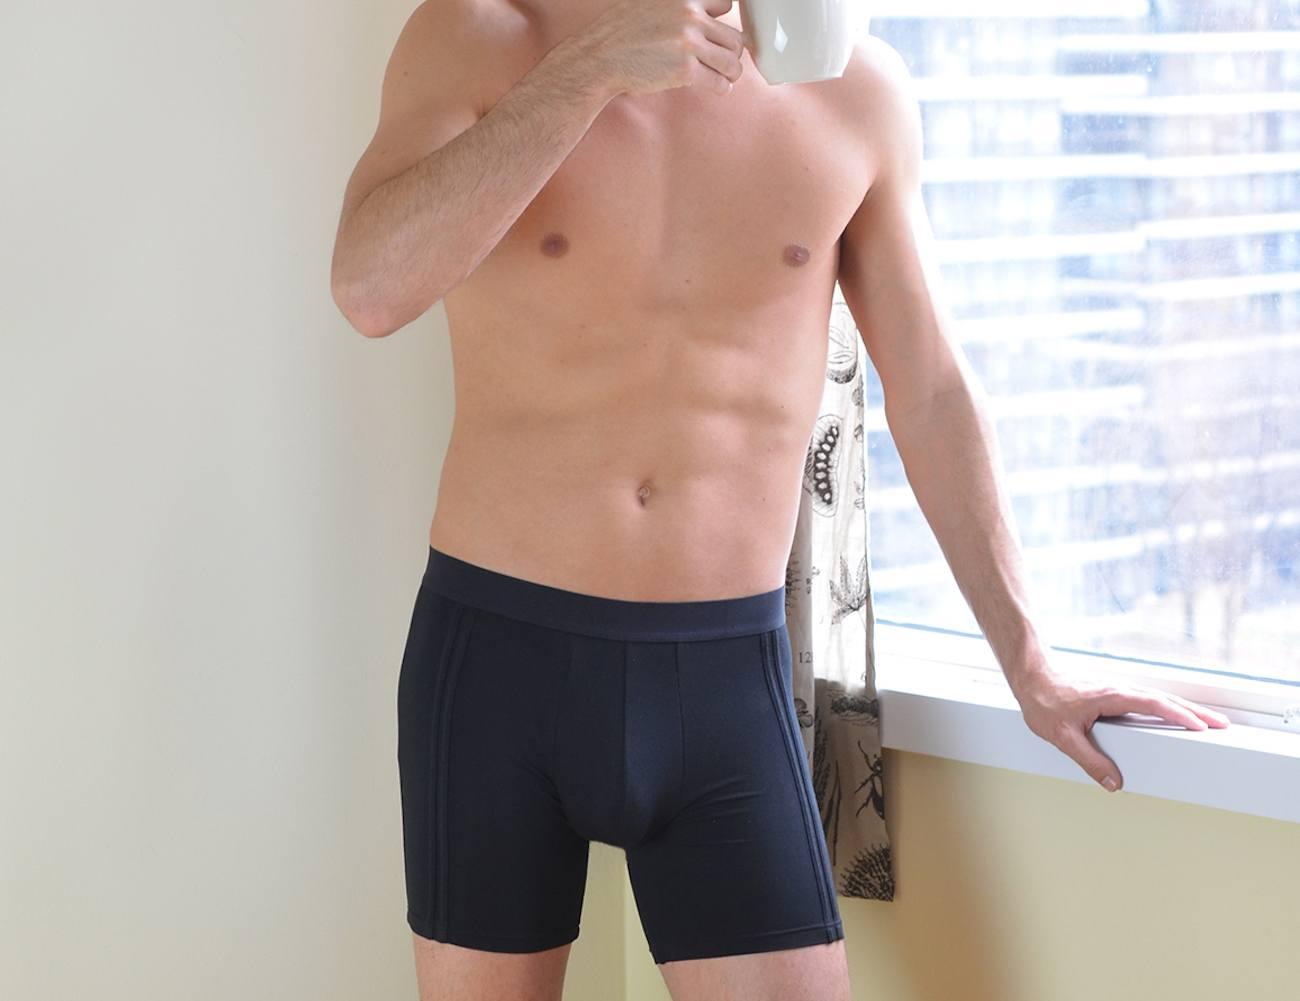 Buddha Boxers Sustainable Underwear